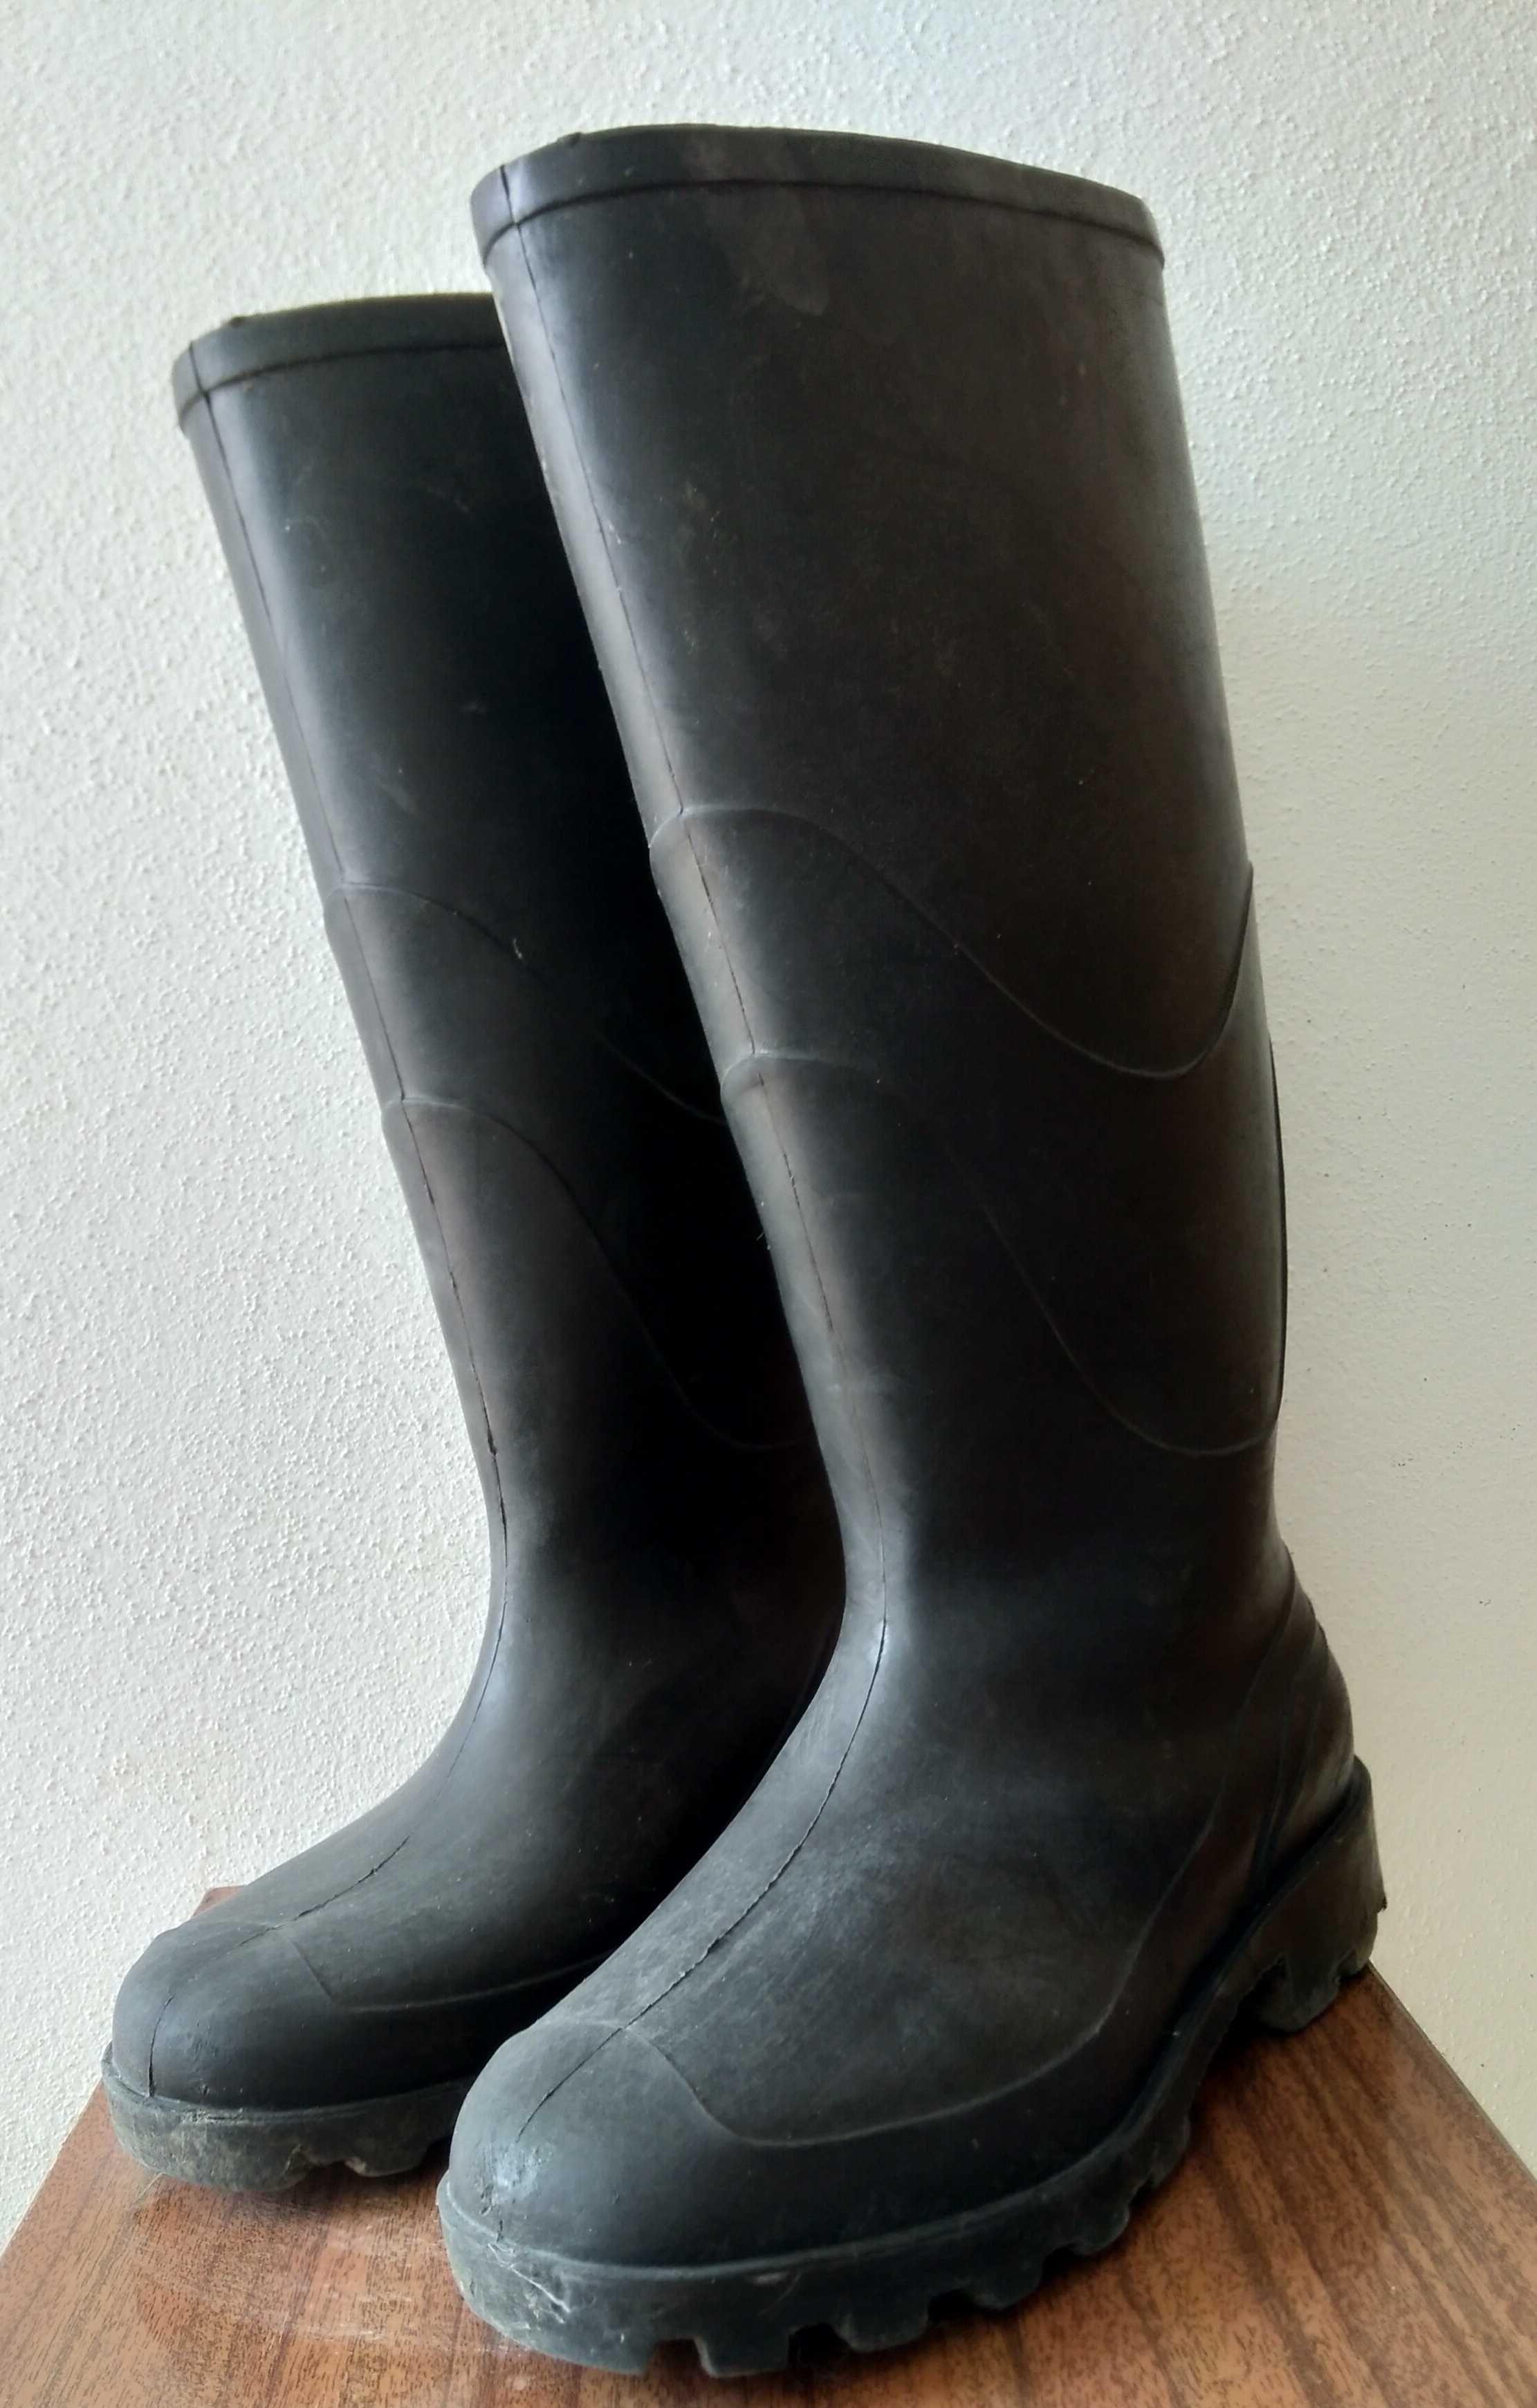 Botas de borracha tamanho 42, galocha